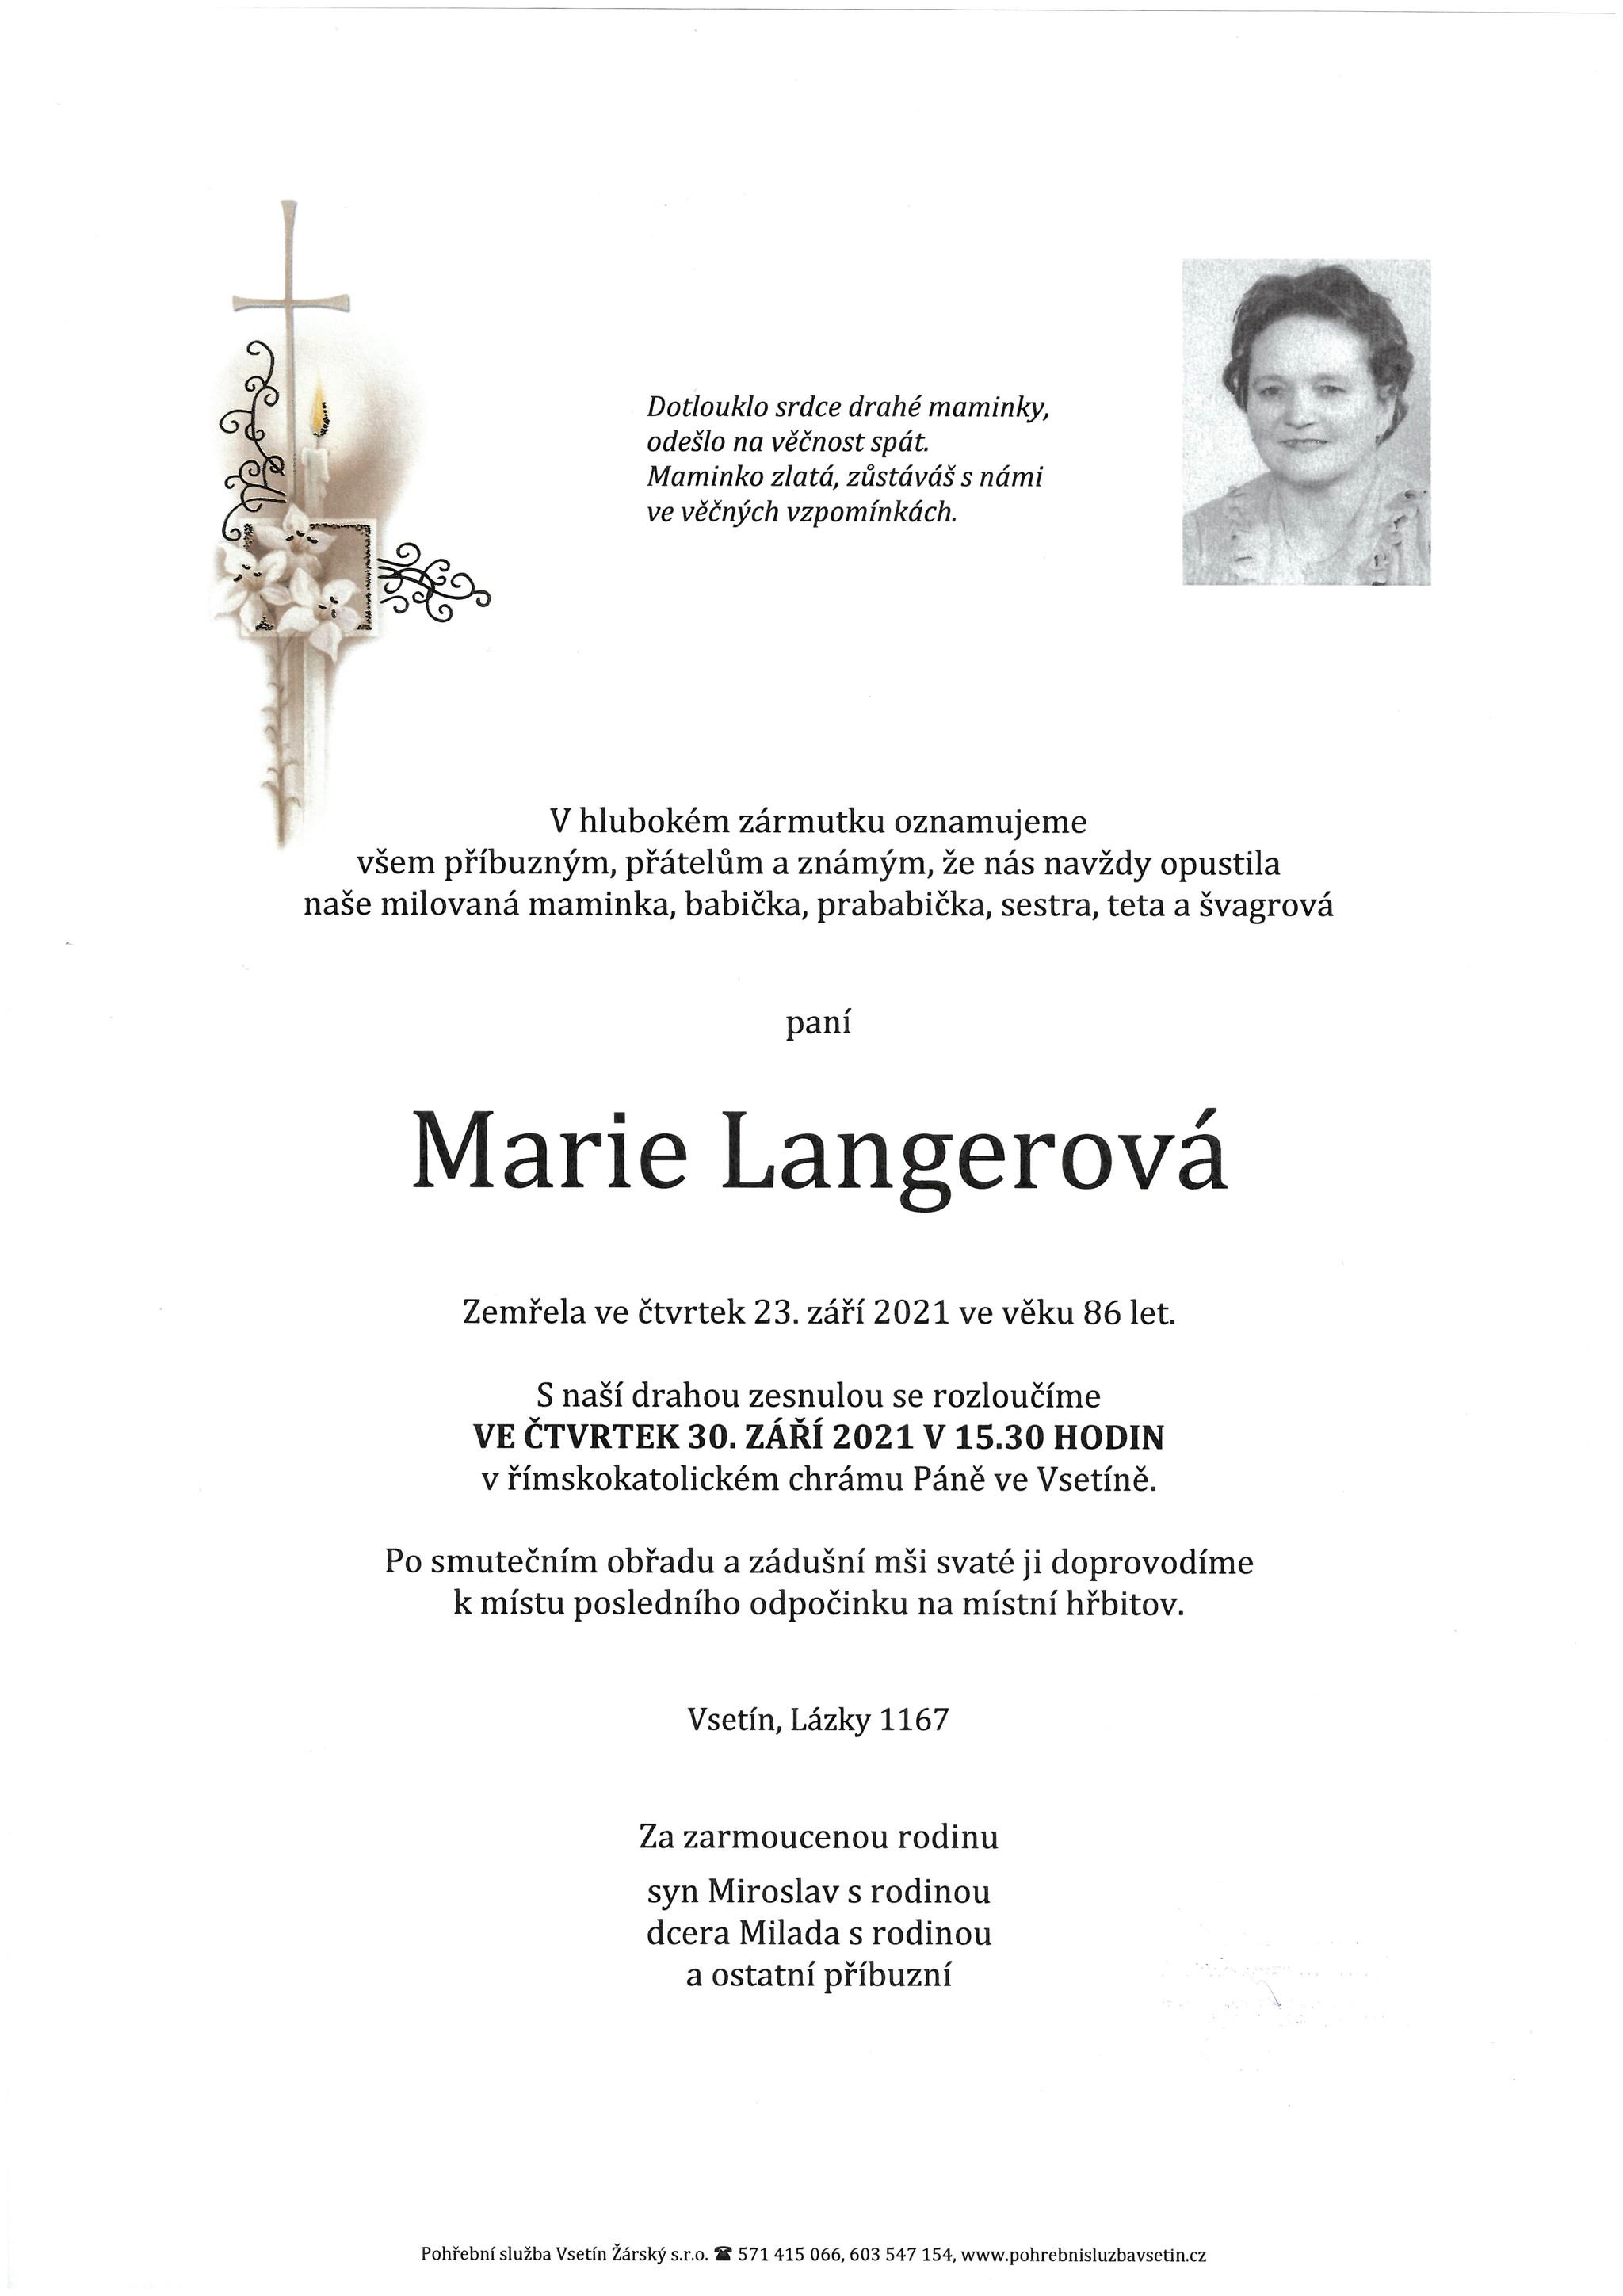 Marie Langerová